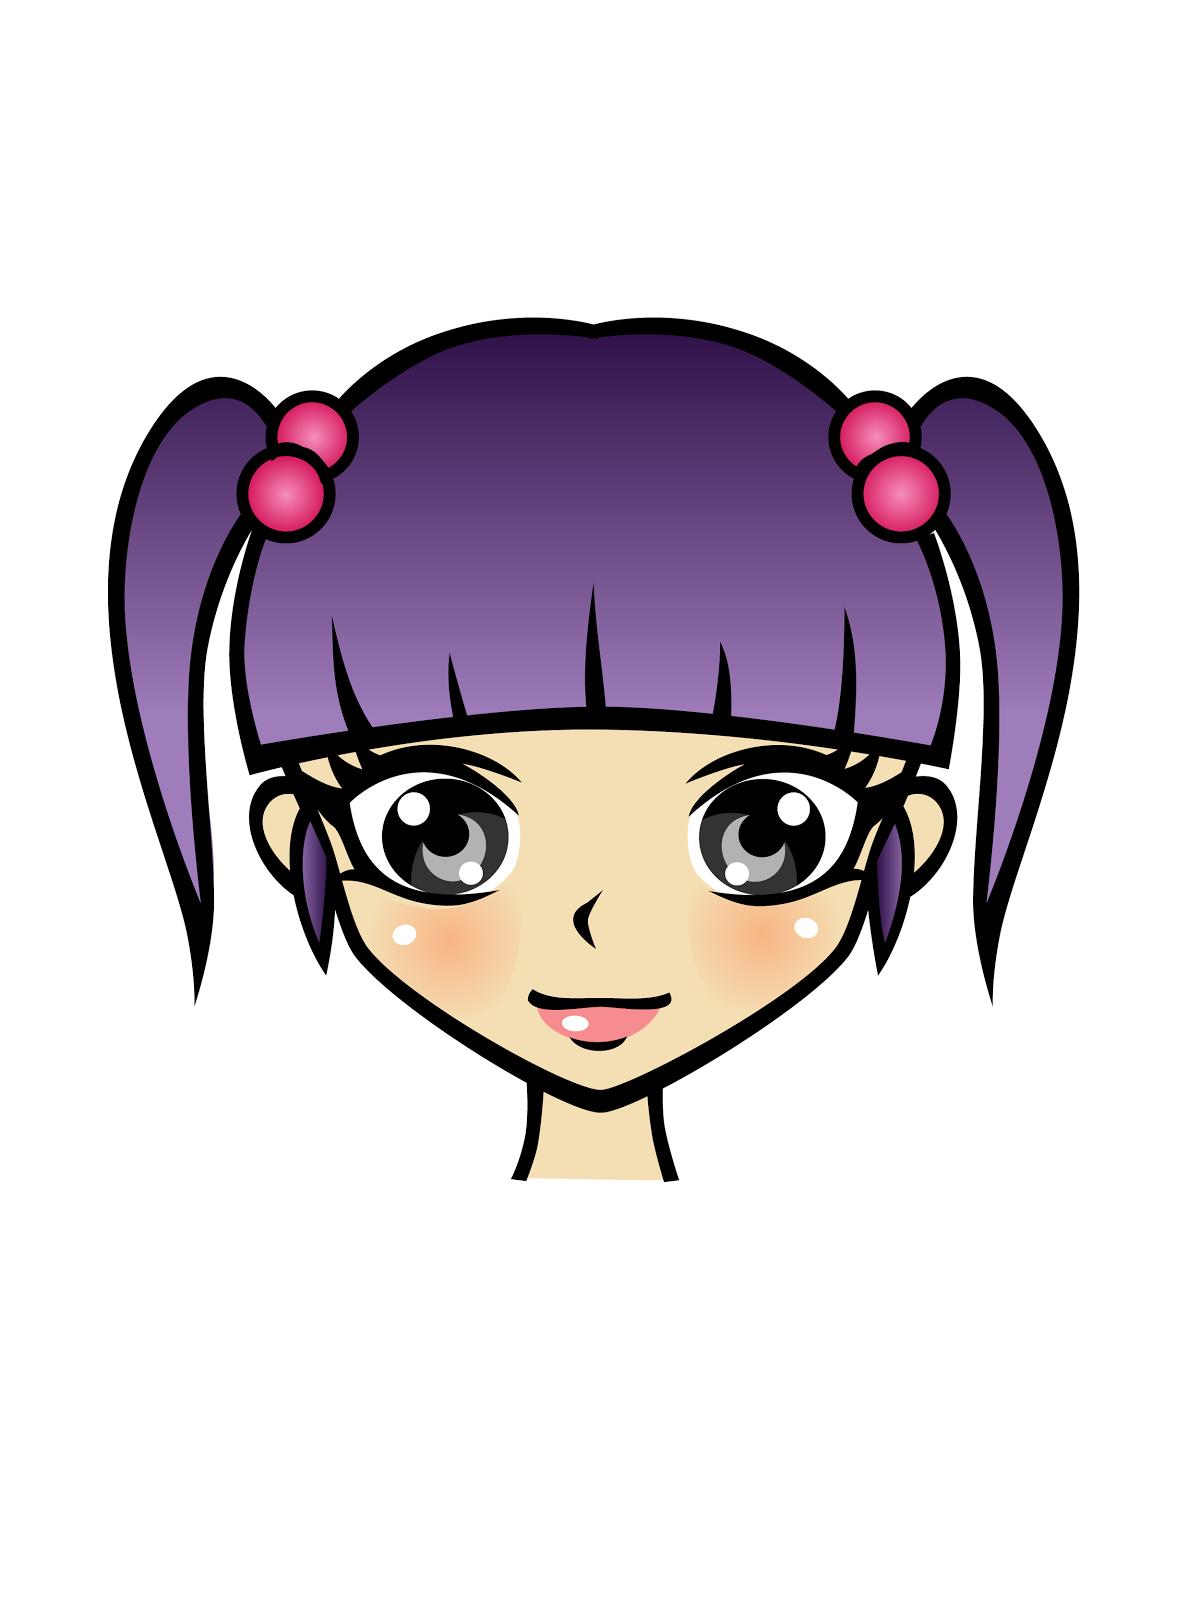 Manga character clipart.